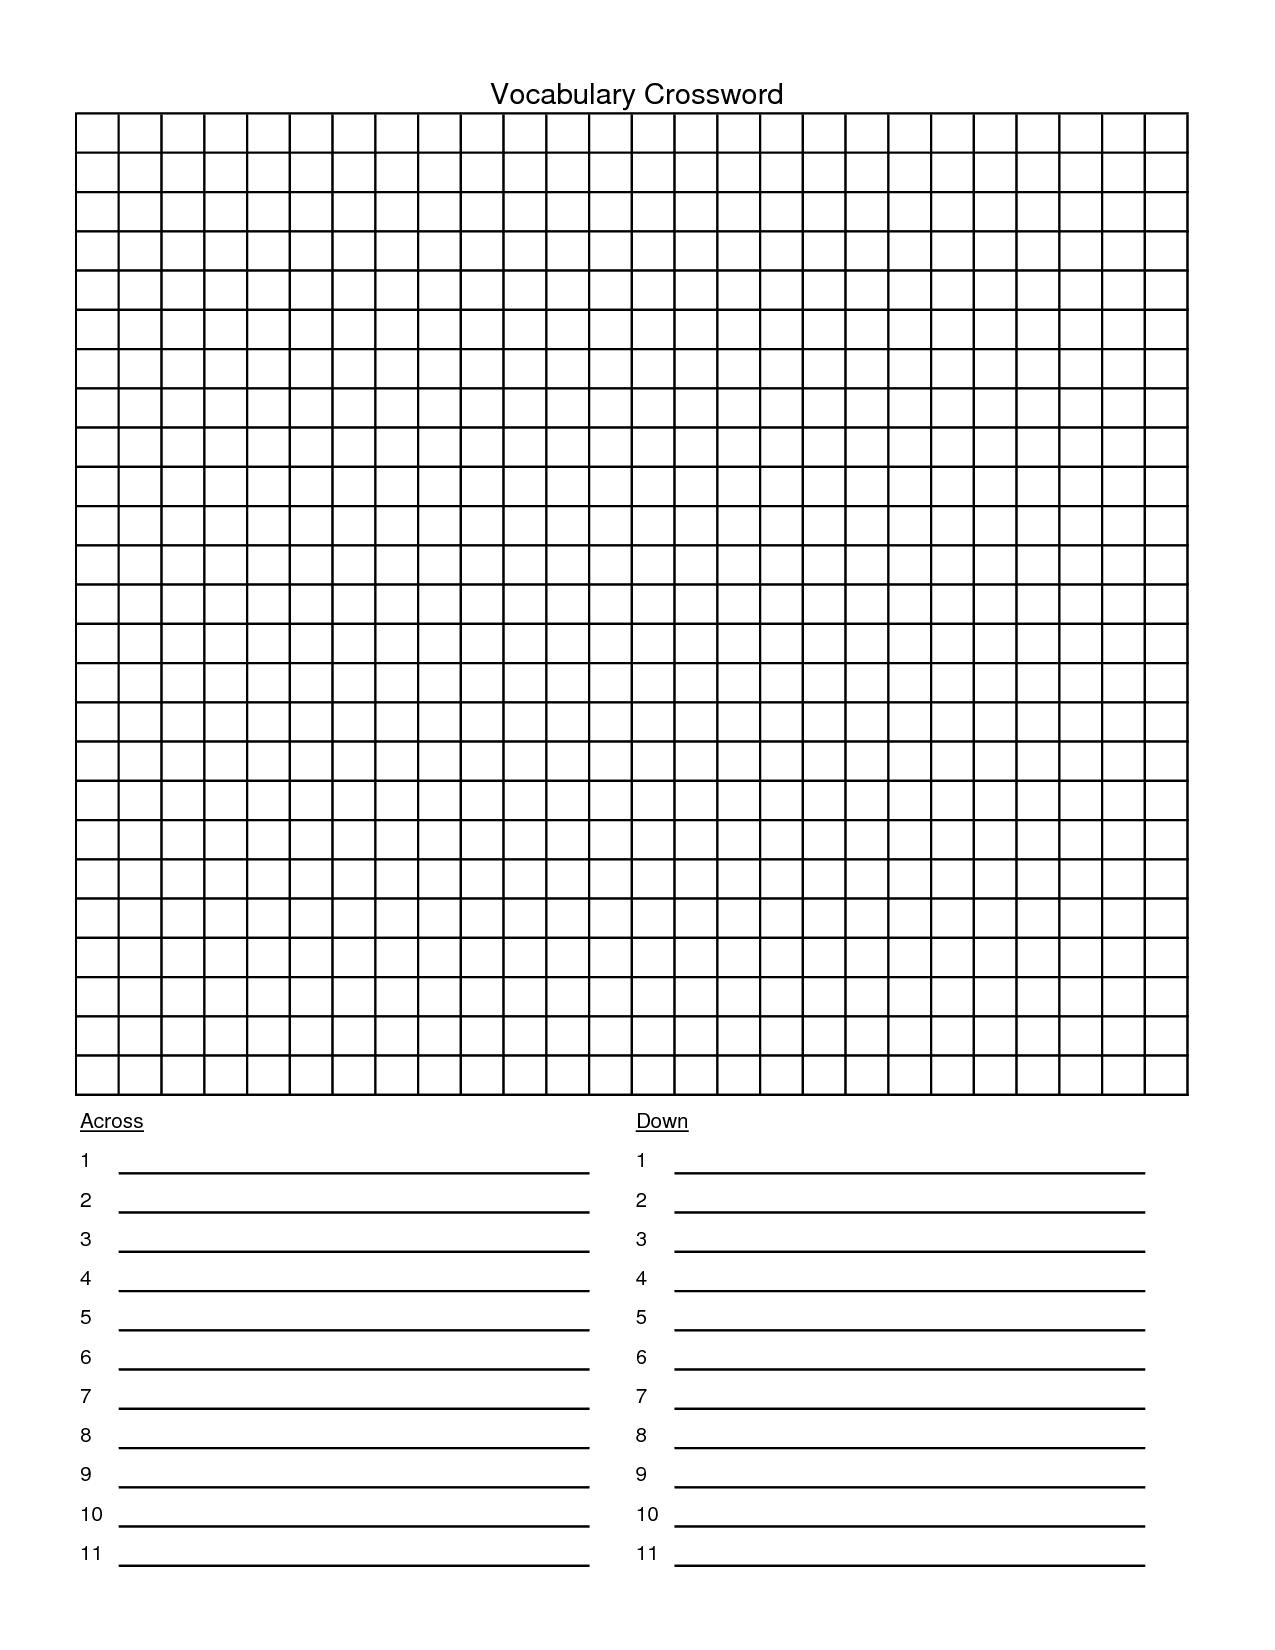 Crossword Puzzle Template - Yapis.sticken.co - Custom Crossword Puzzle Printable